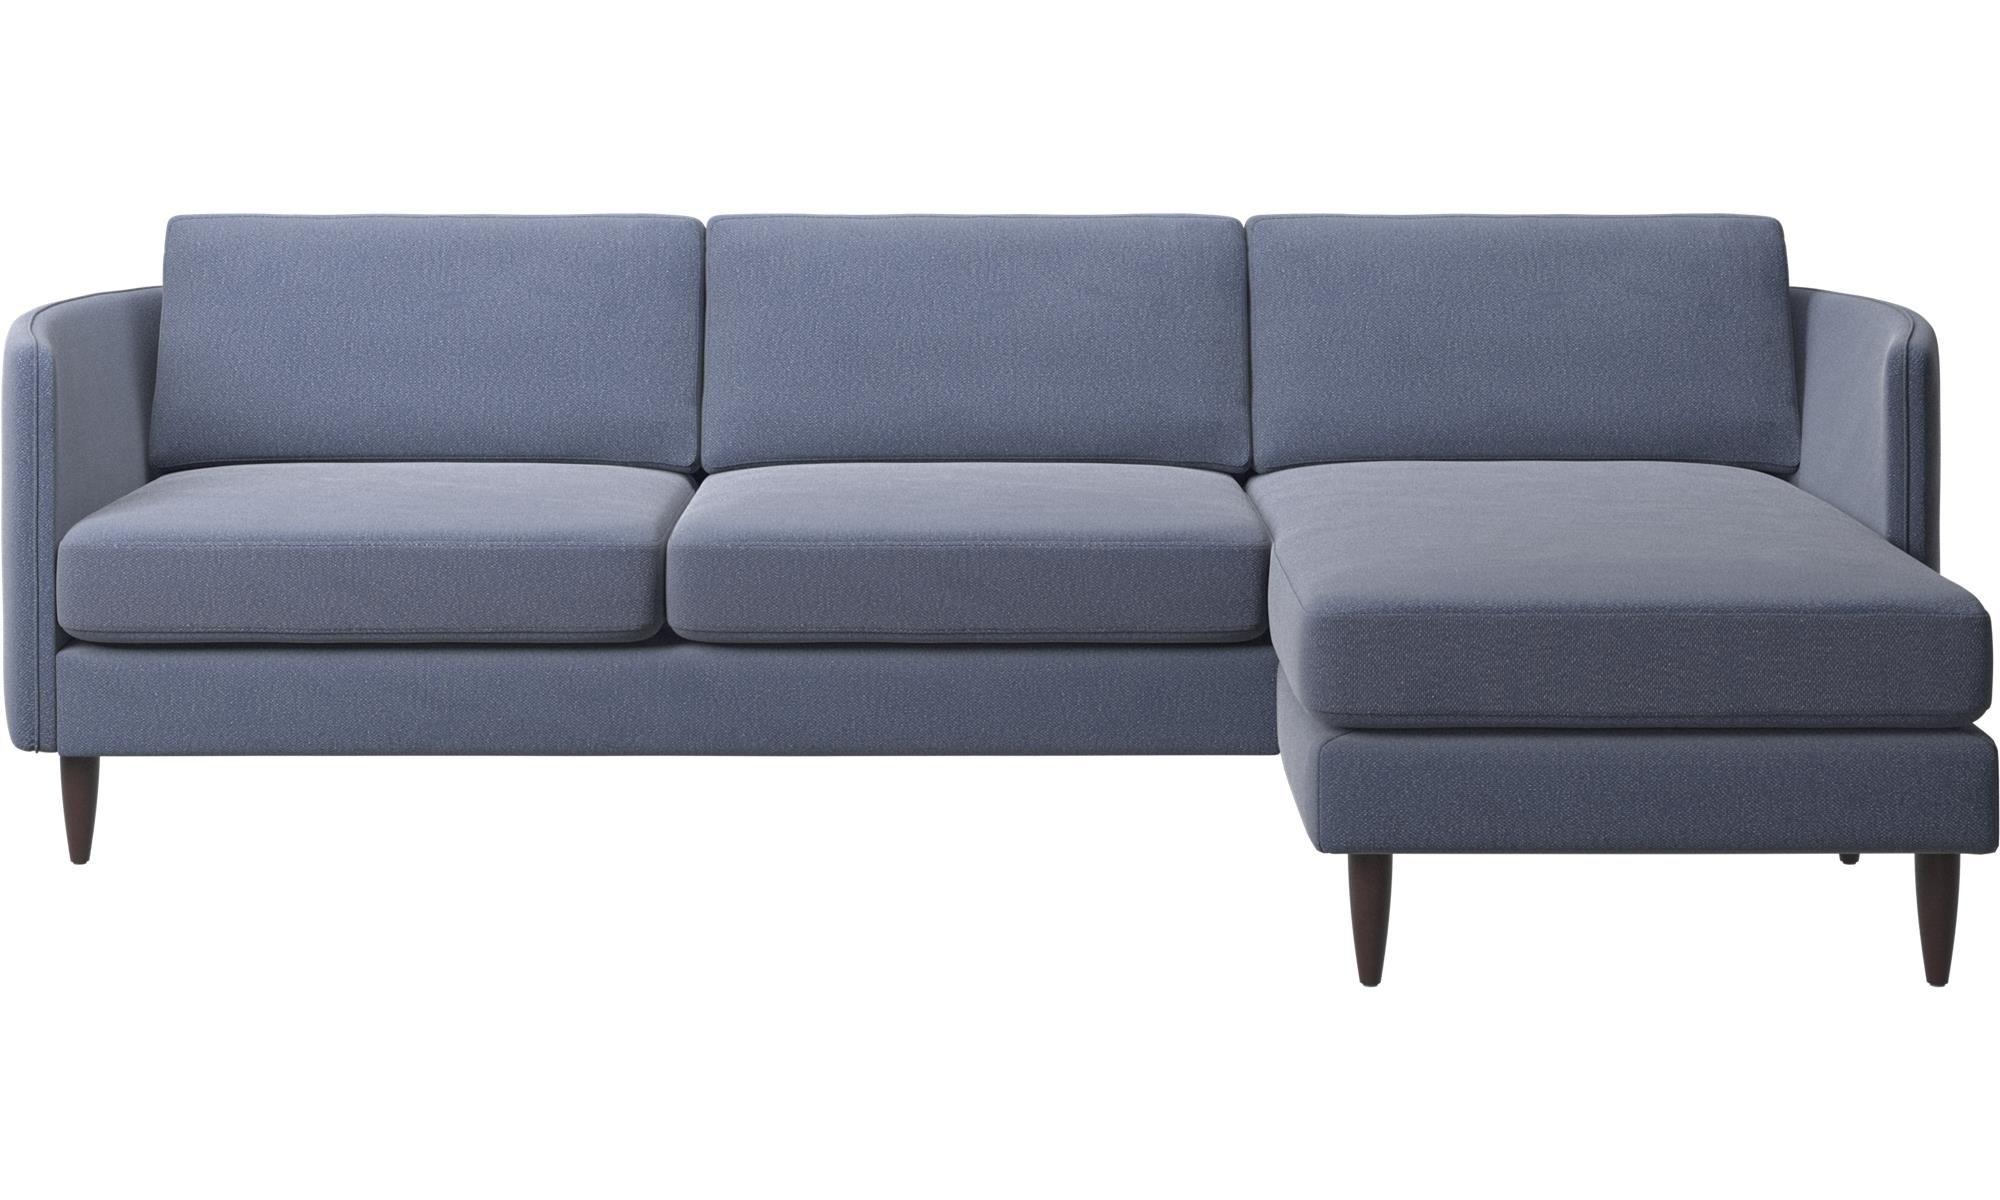 Chaise Lounge Sofas Osaka Sofa With Resting Unit Regular Seat Chaise Lounge Sofa Comfortable Chaise Sofa